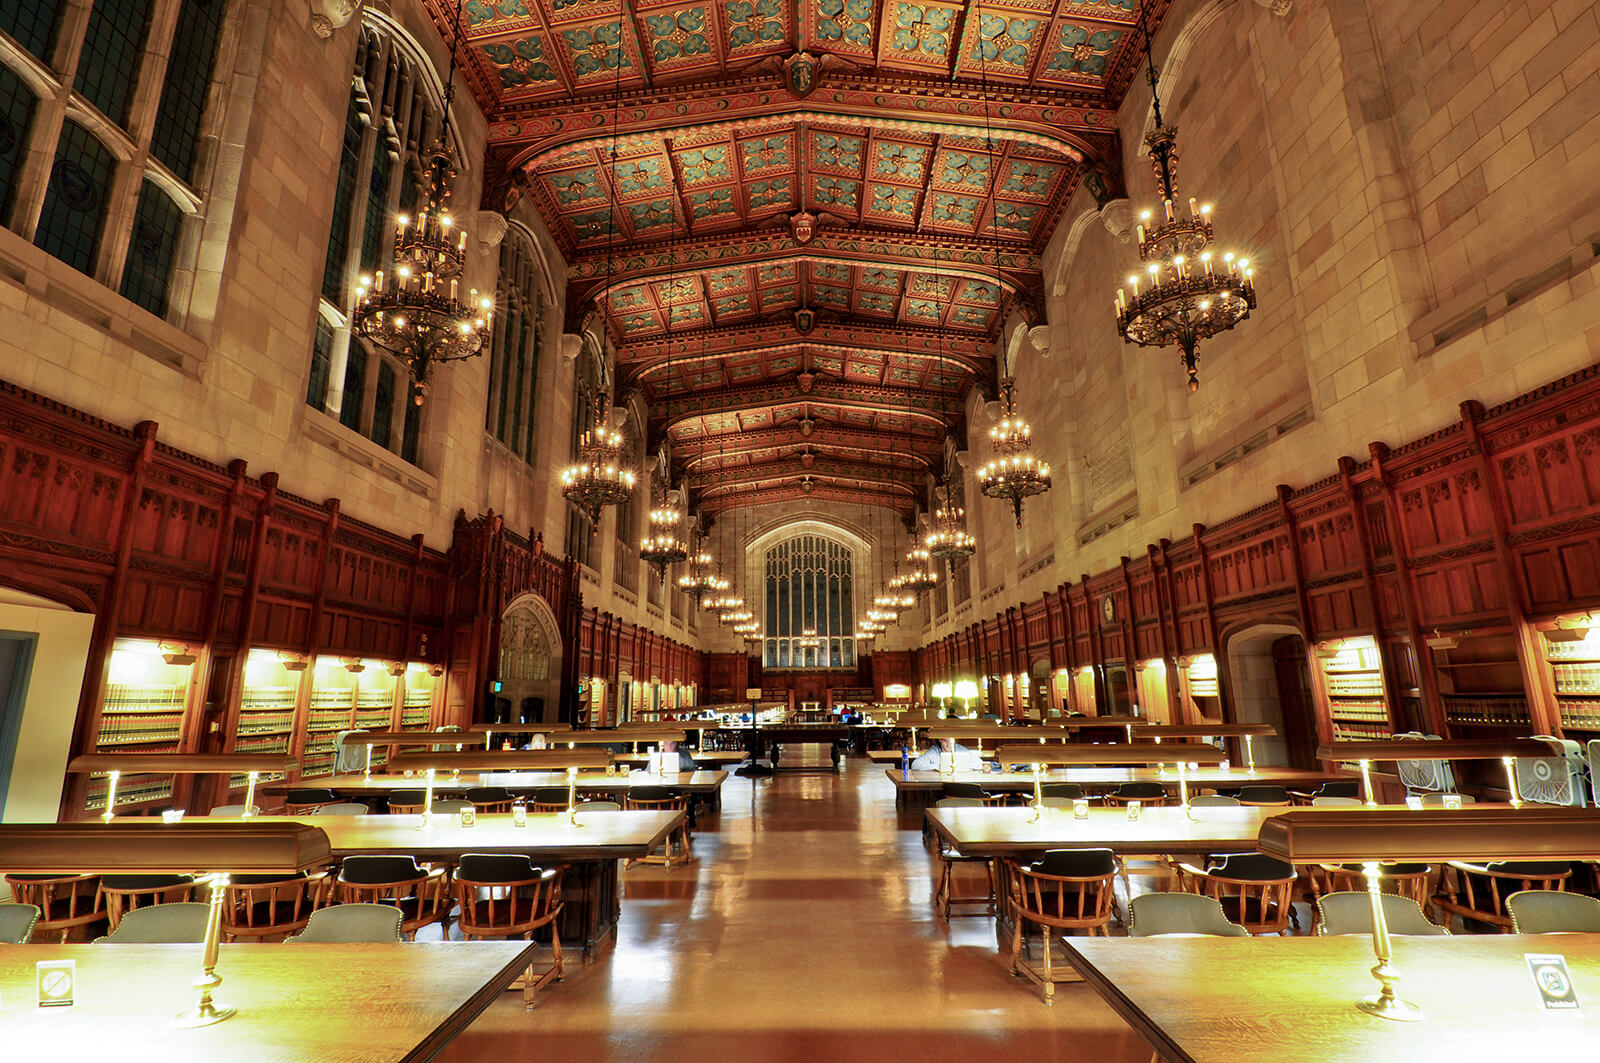 University of Michigan Law Library Ann Arbor MI